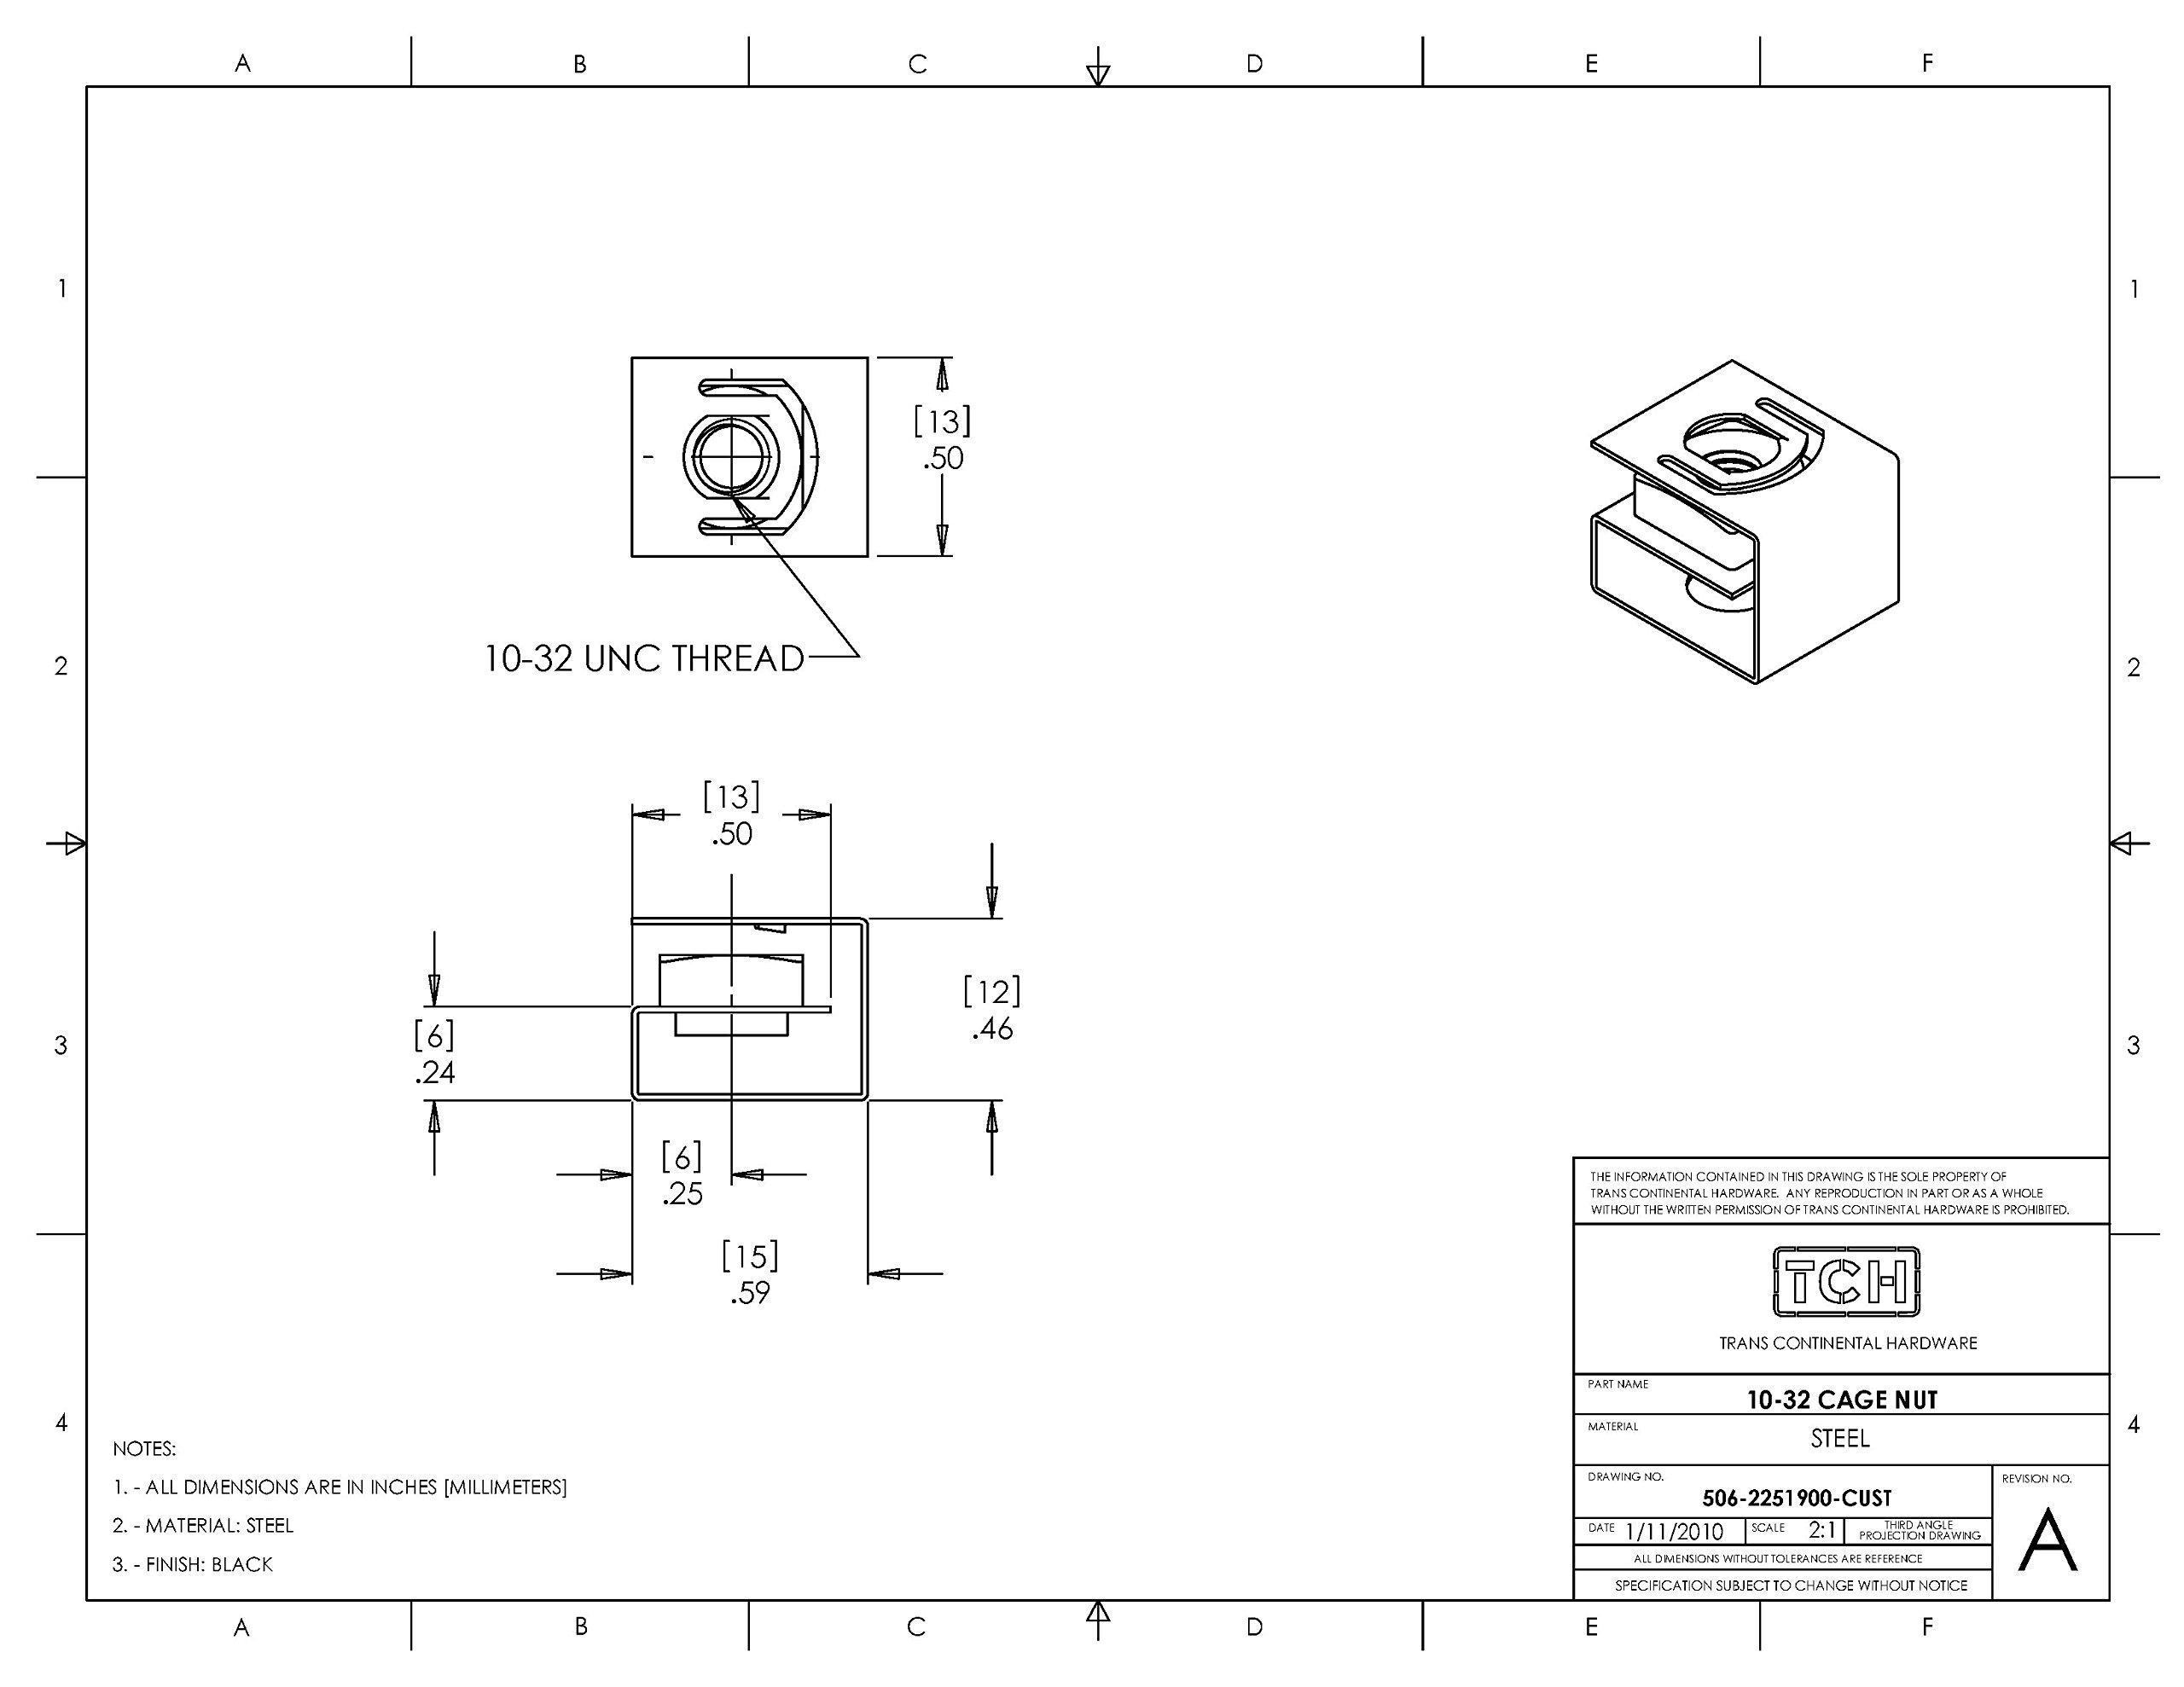 TCH Hardware 100 Pack Black Steel Cage Nuts 10-32 UNF - Network Server AV Rack Mount Shelves Cabinet Rail Caged Captive Clip by TCH (Image #3)